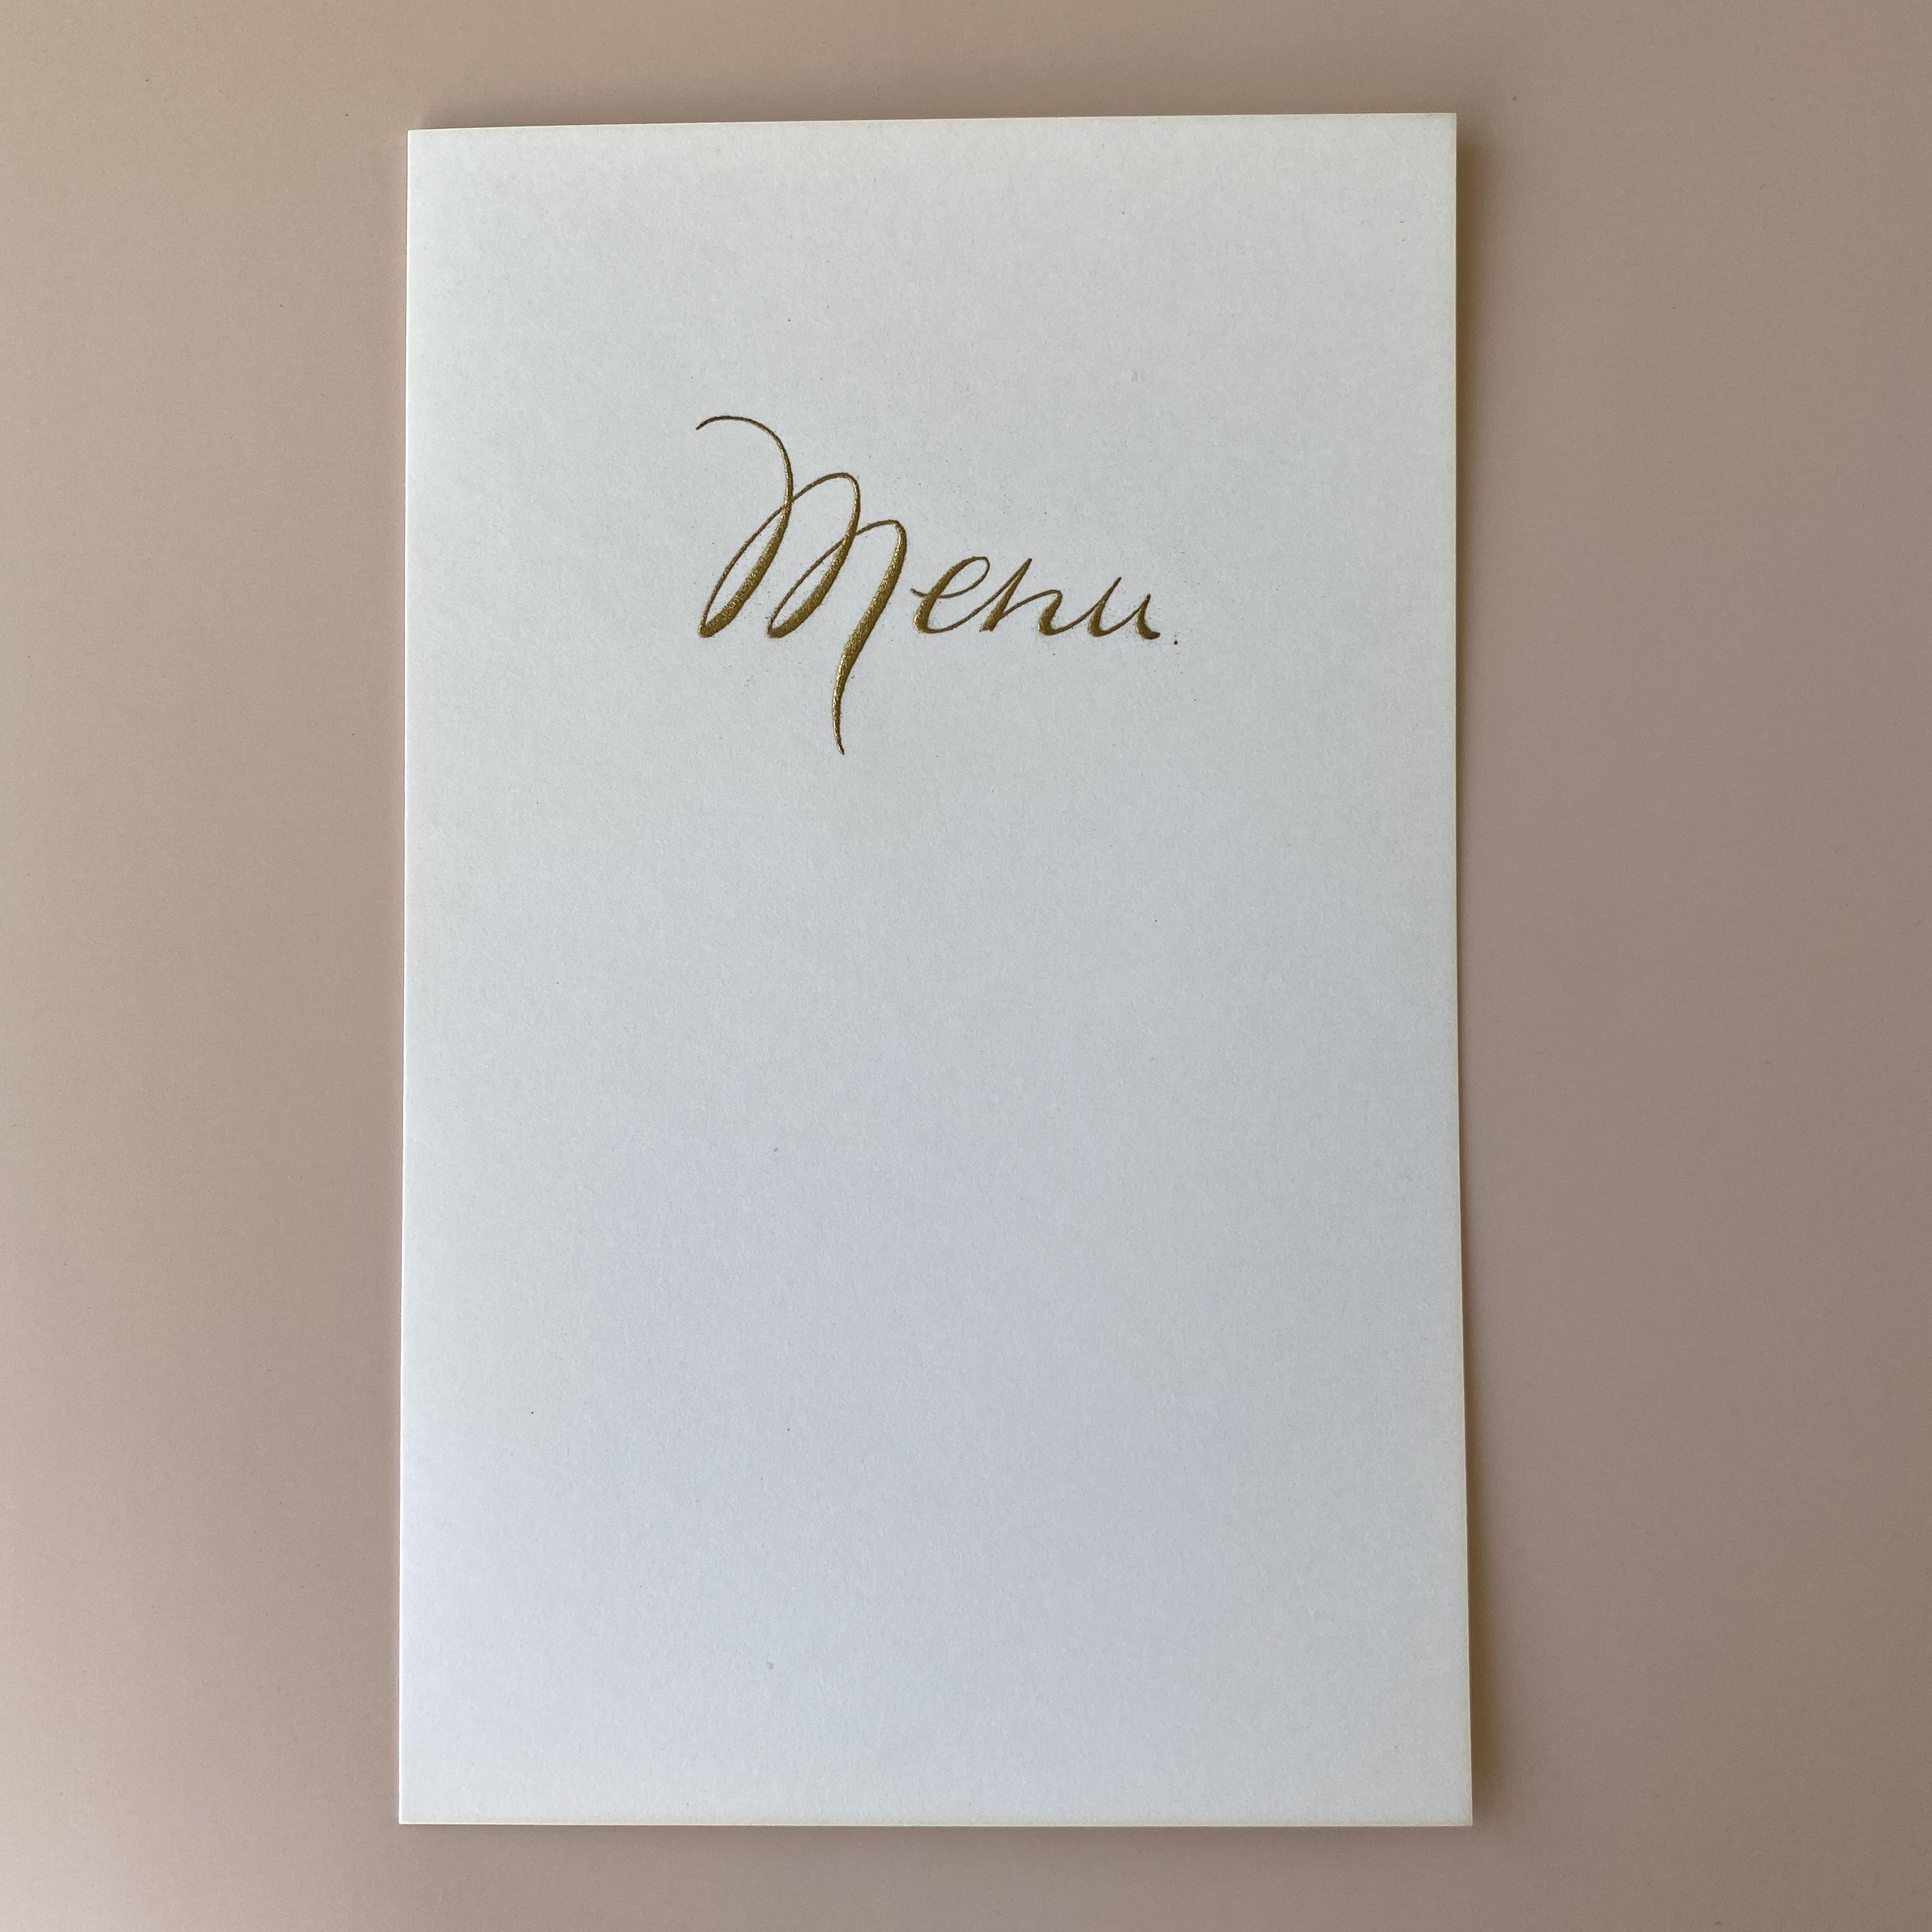 France  menuカード・金文字  3枚セット / vp0170